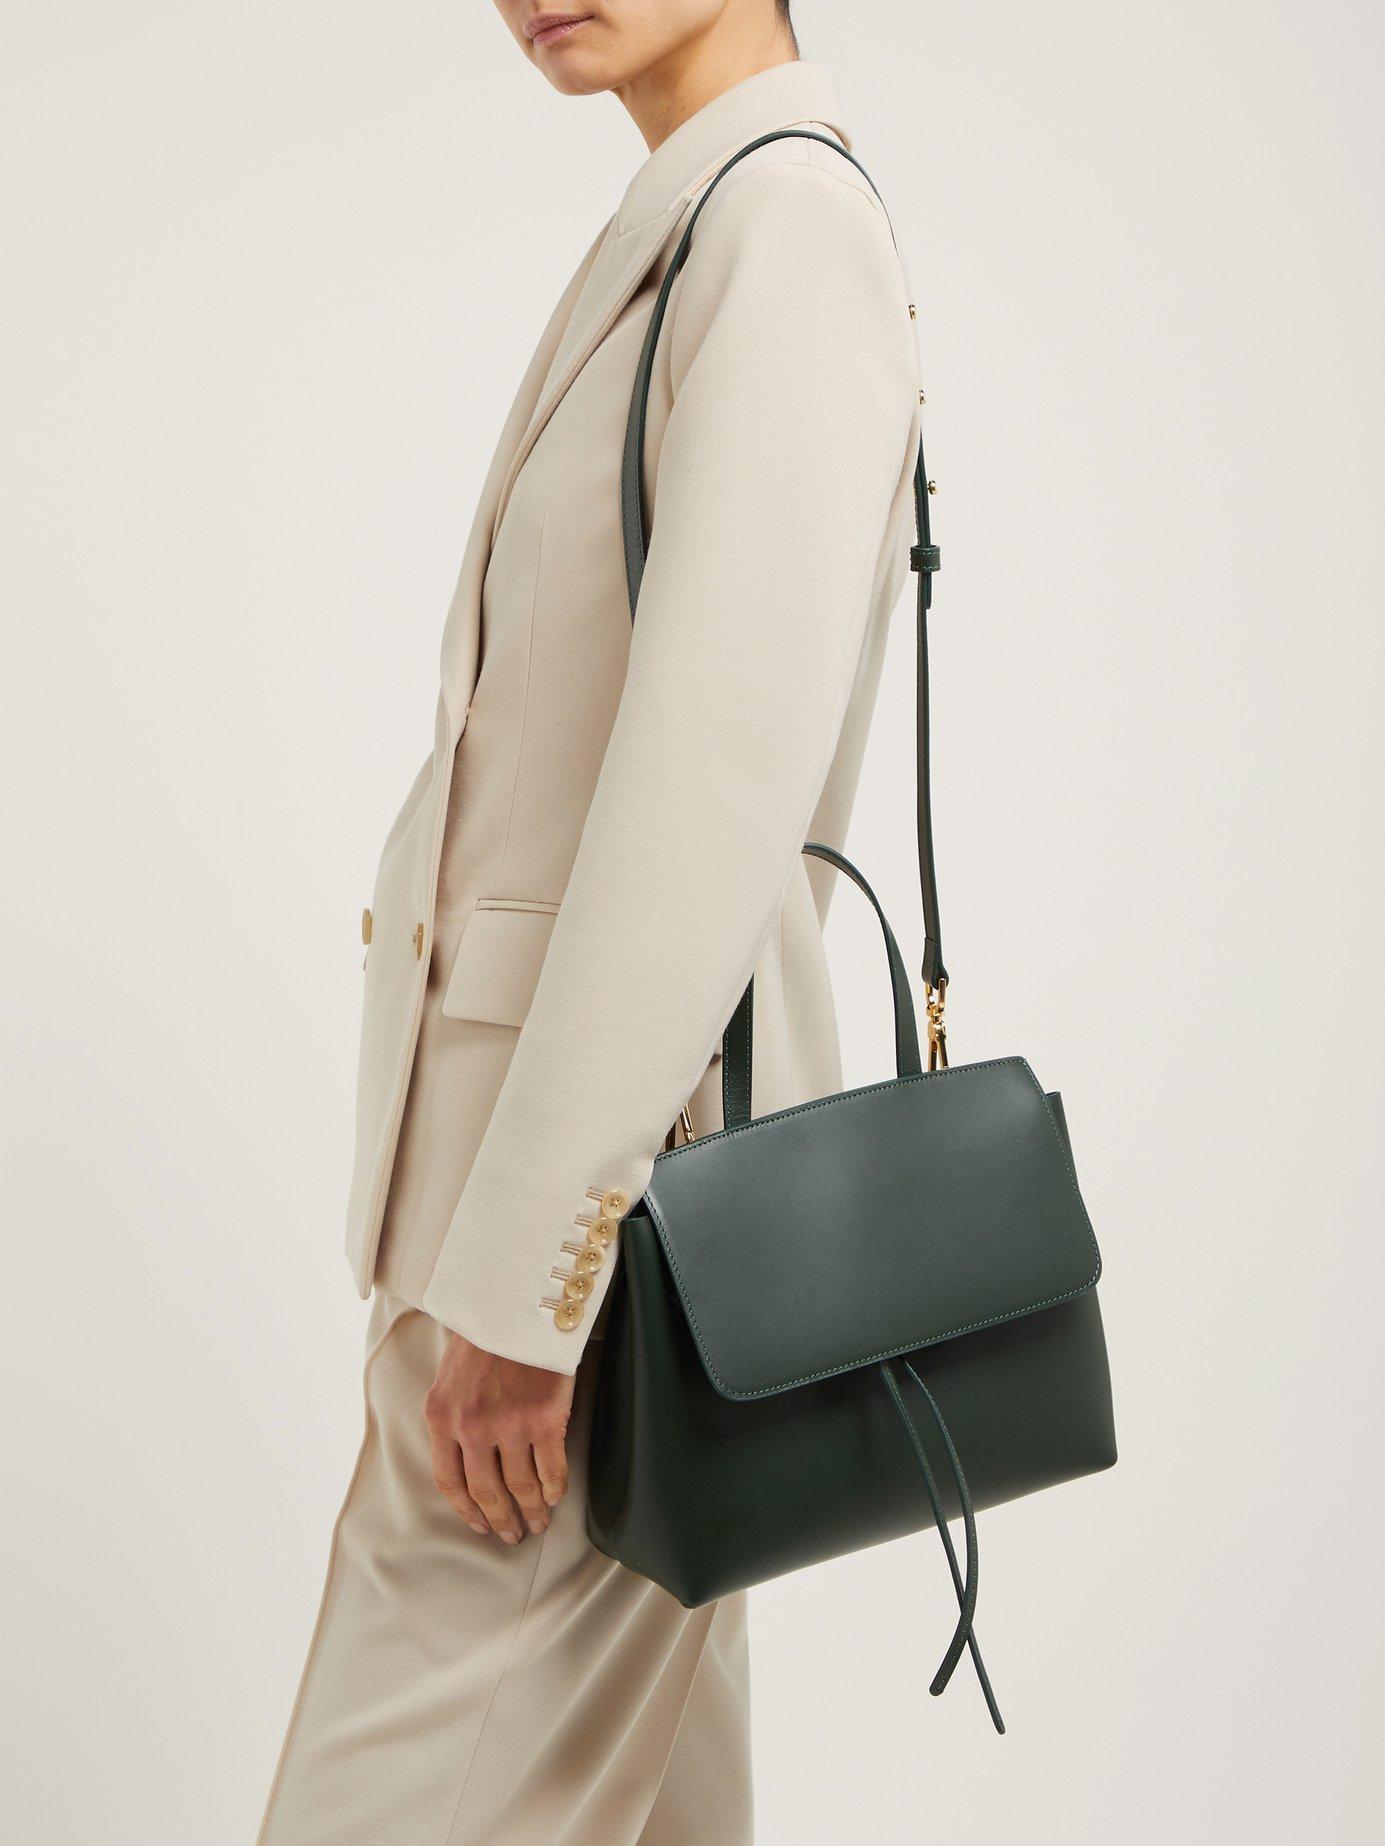 844830adc860 Mansur Gavriel - Green Mini Lady Leather Cross Body Bag - Lyst. View  fullscreen